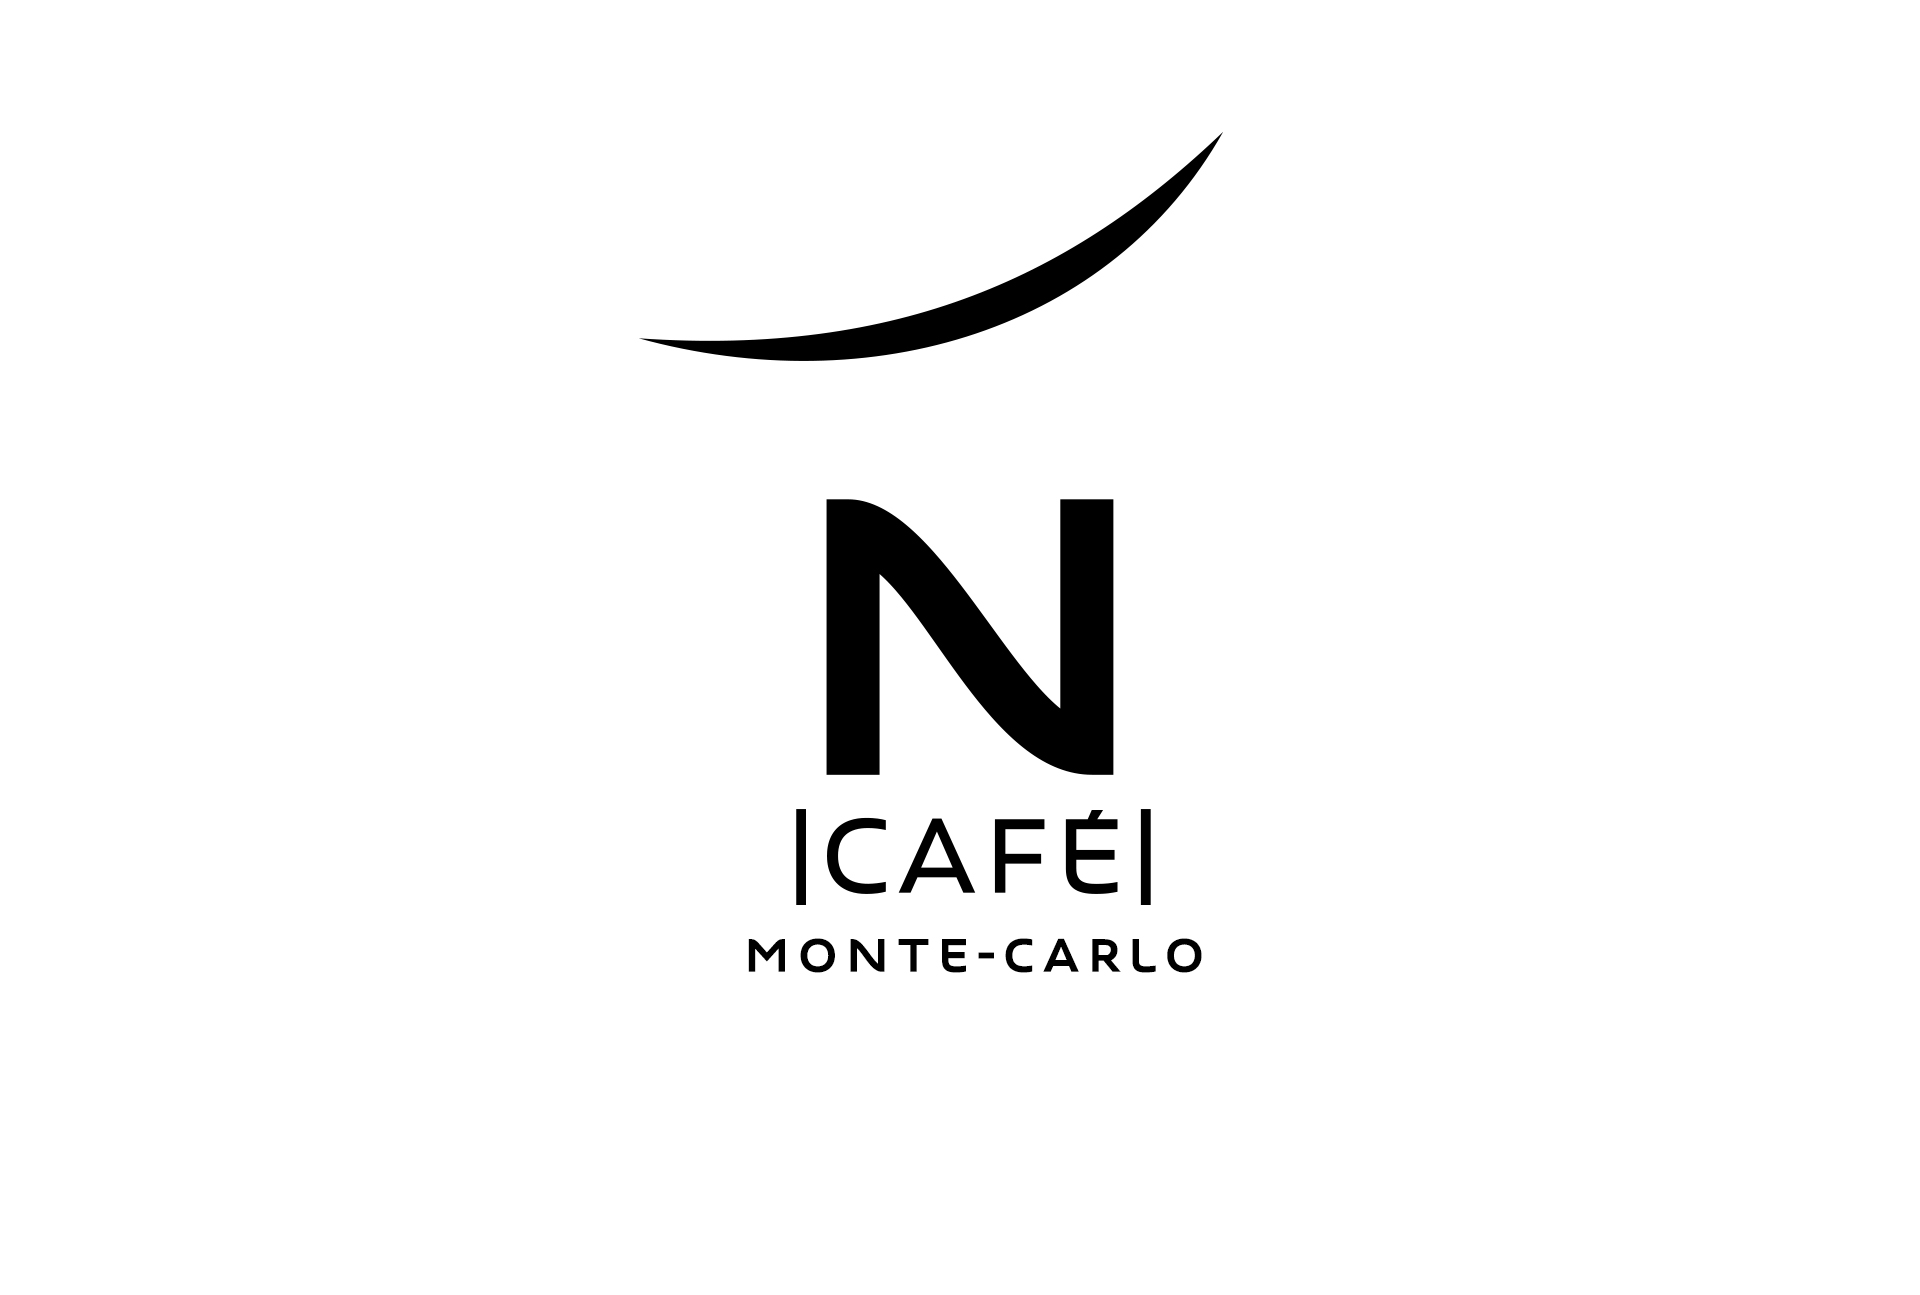 NOVOTEL MONTE-CARLO